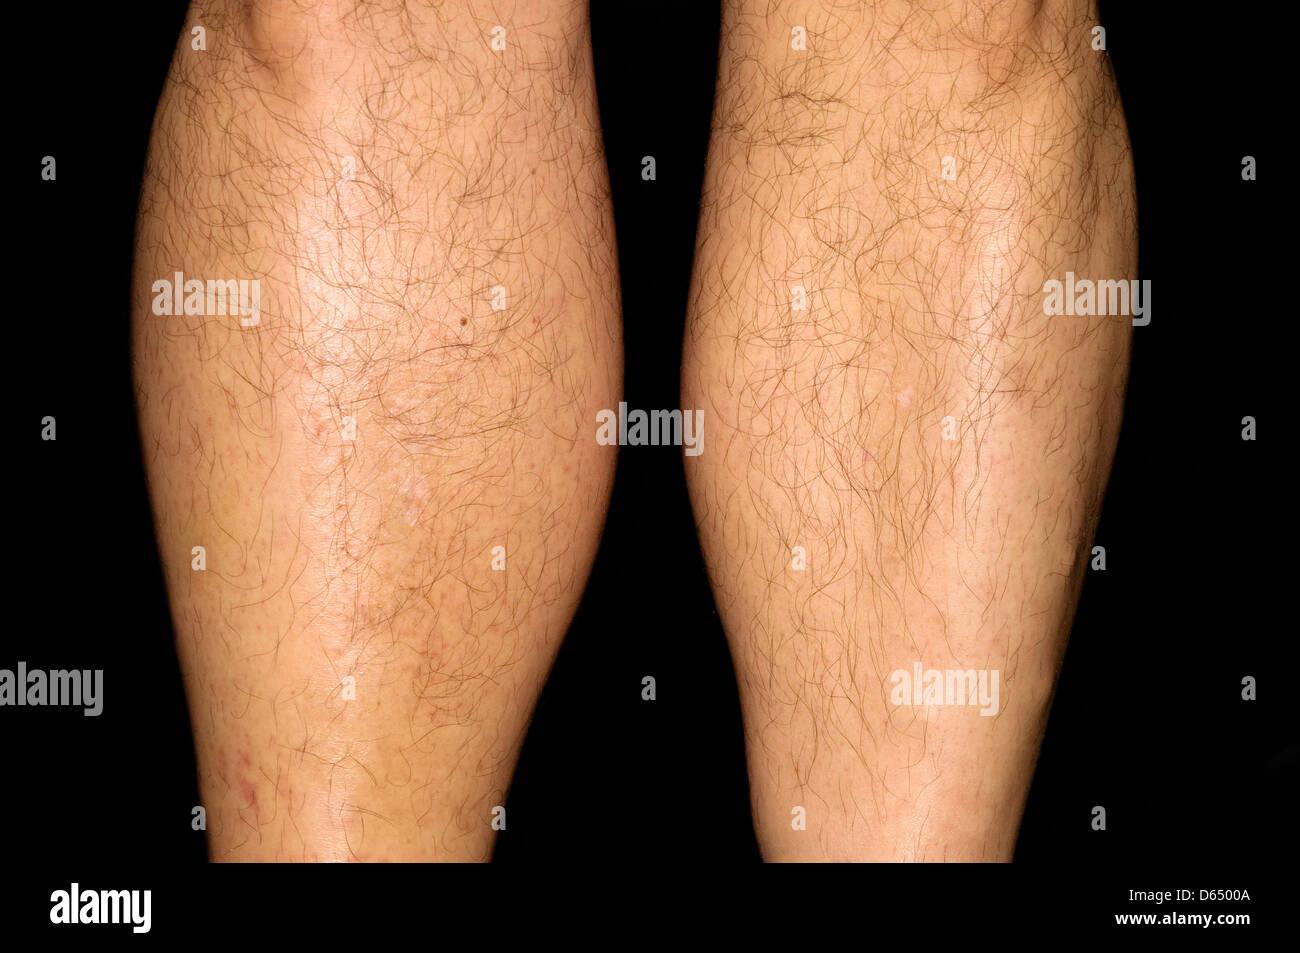 Deep vein thrombosis - Stock Image